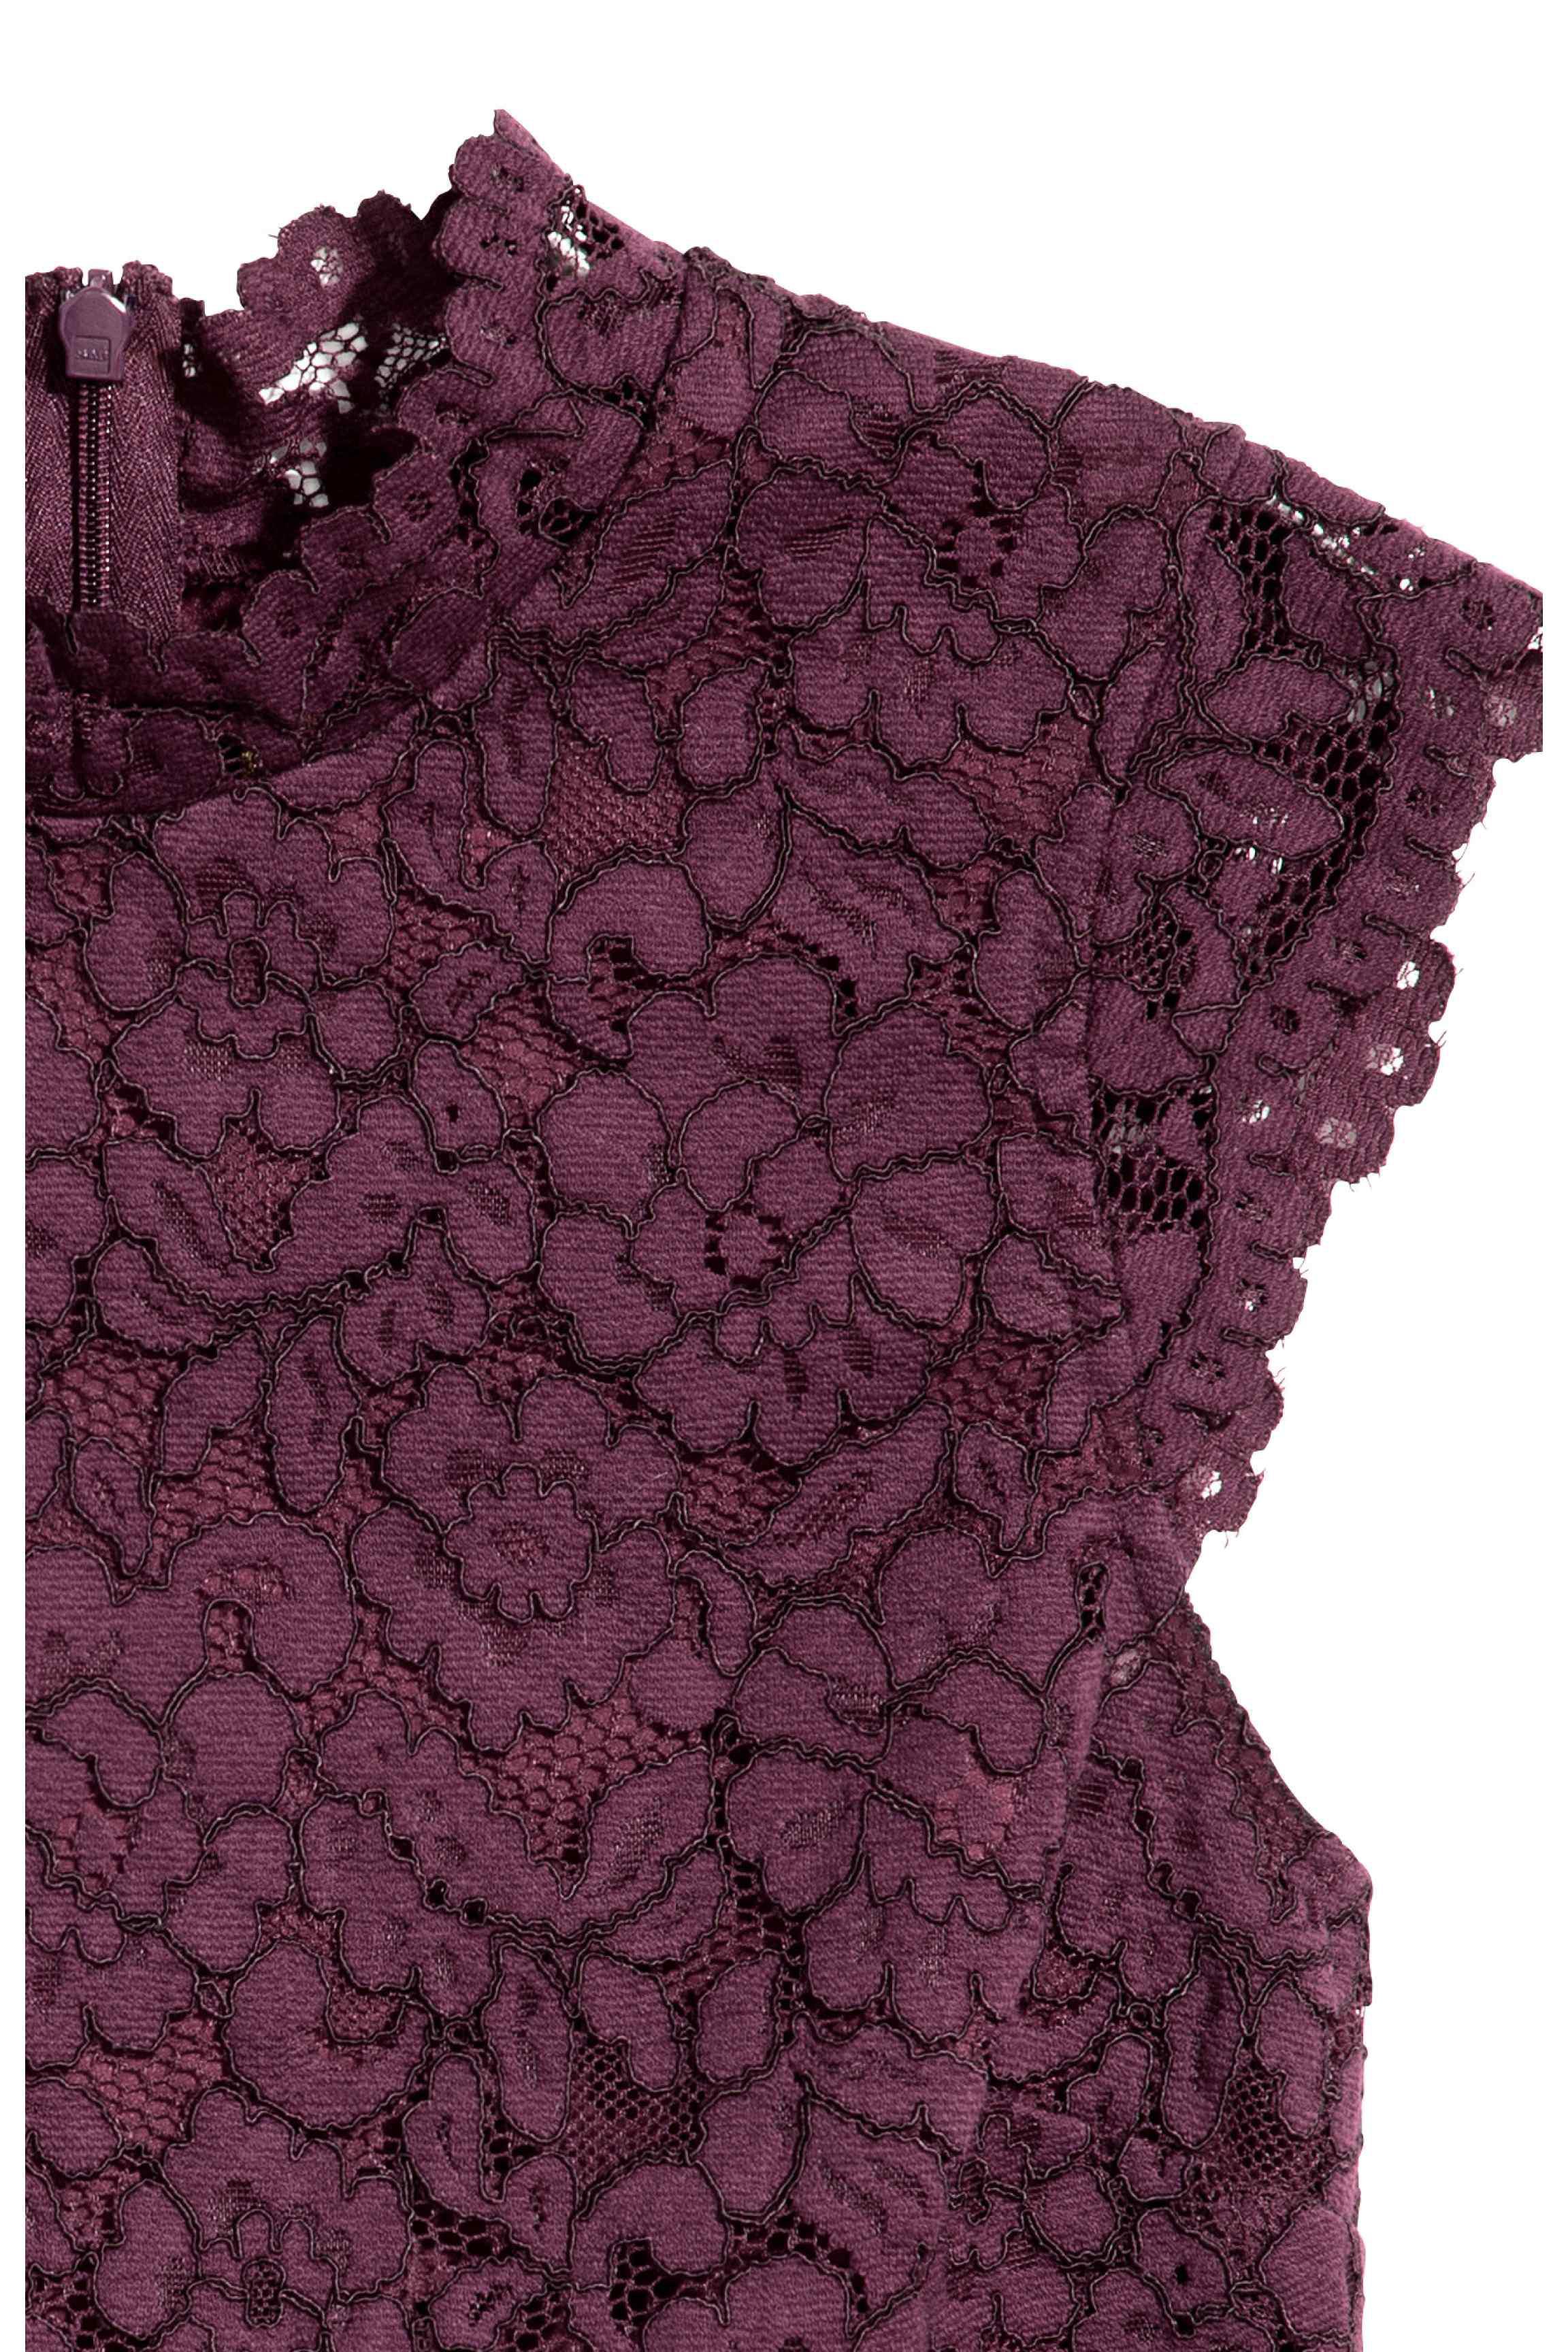 H&M Lace Top in Plum (Purple)